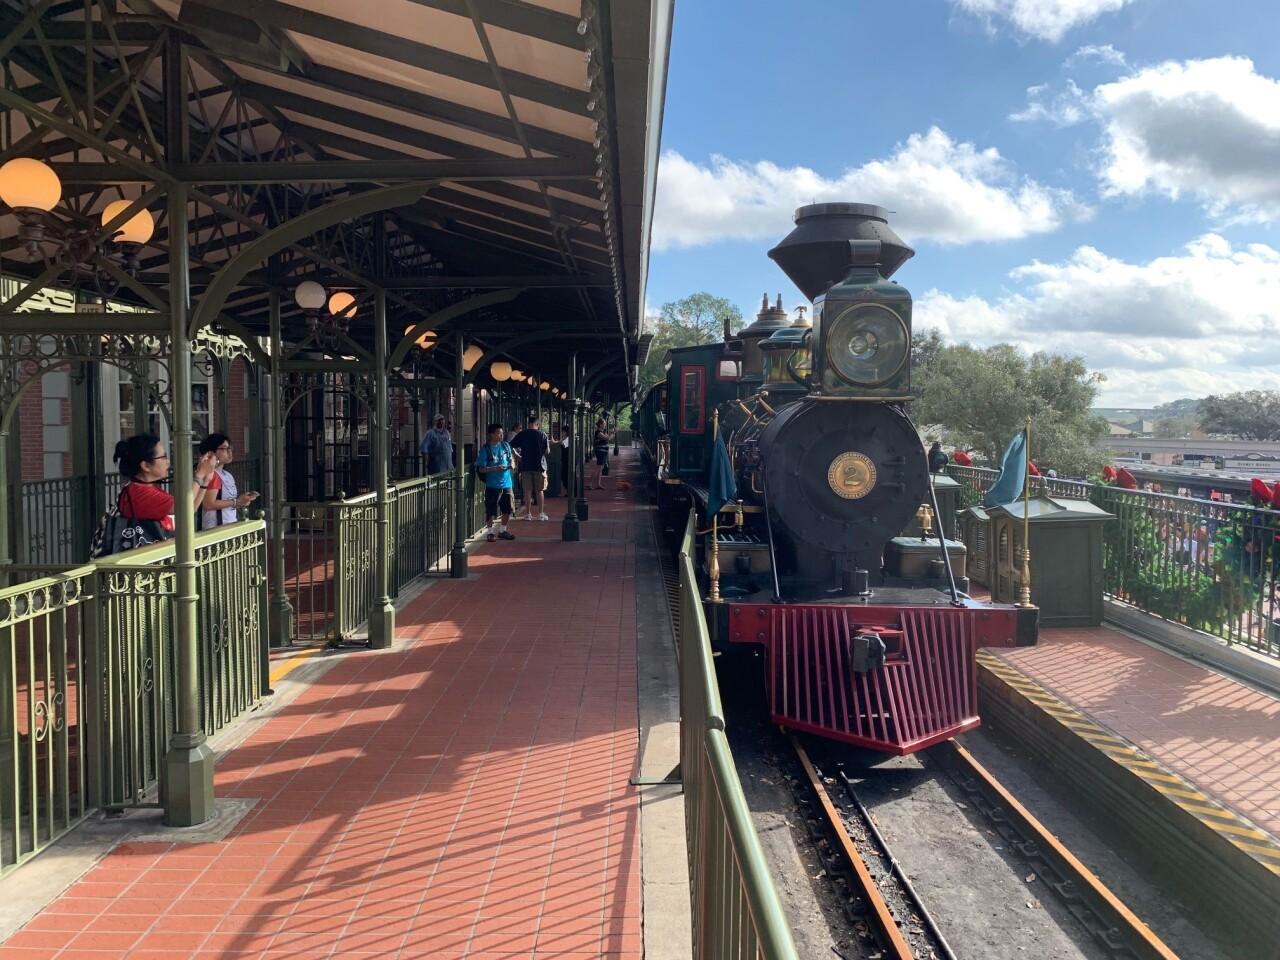 Magic Kingdom visitors take photographs of the engine for the temporarily dormant Walt Disney World Railroad.